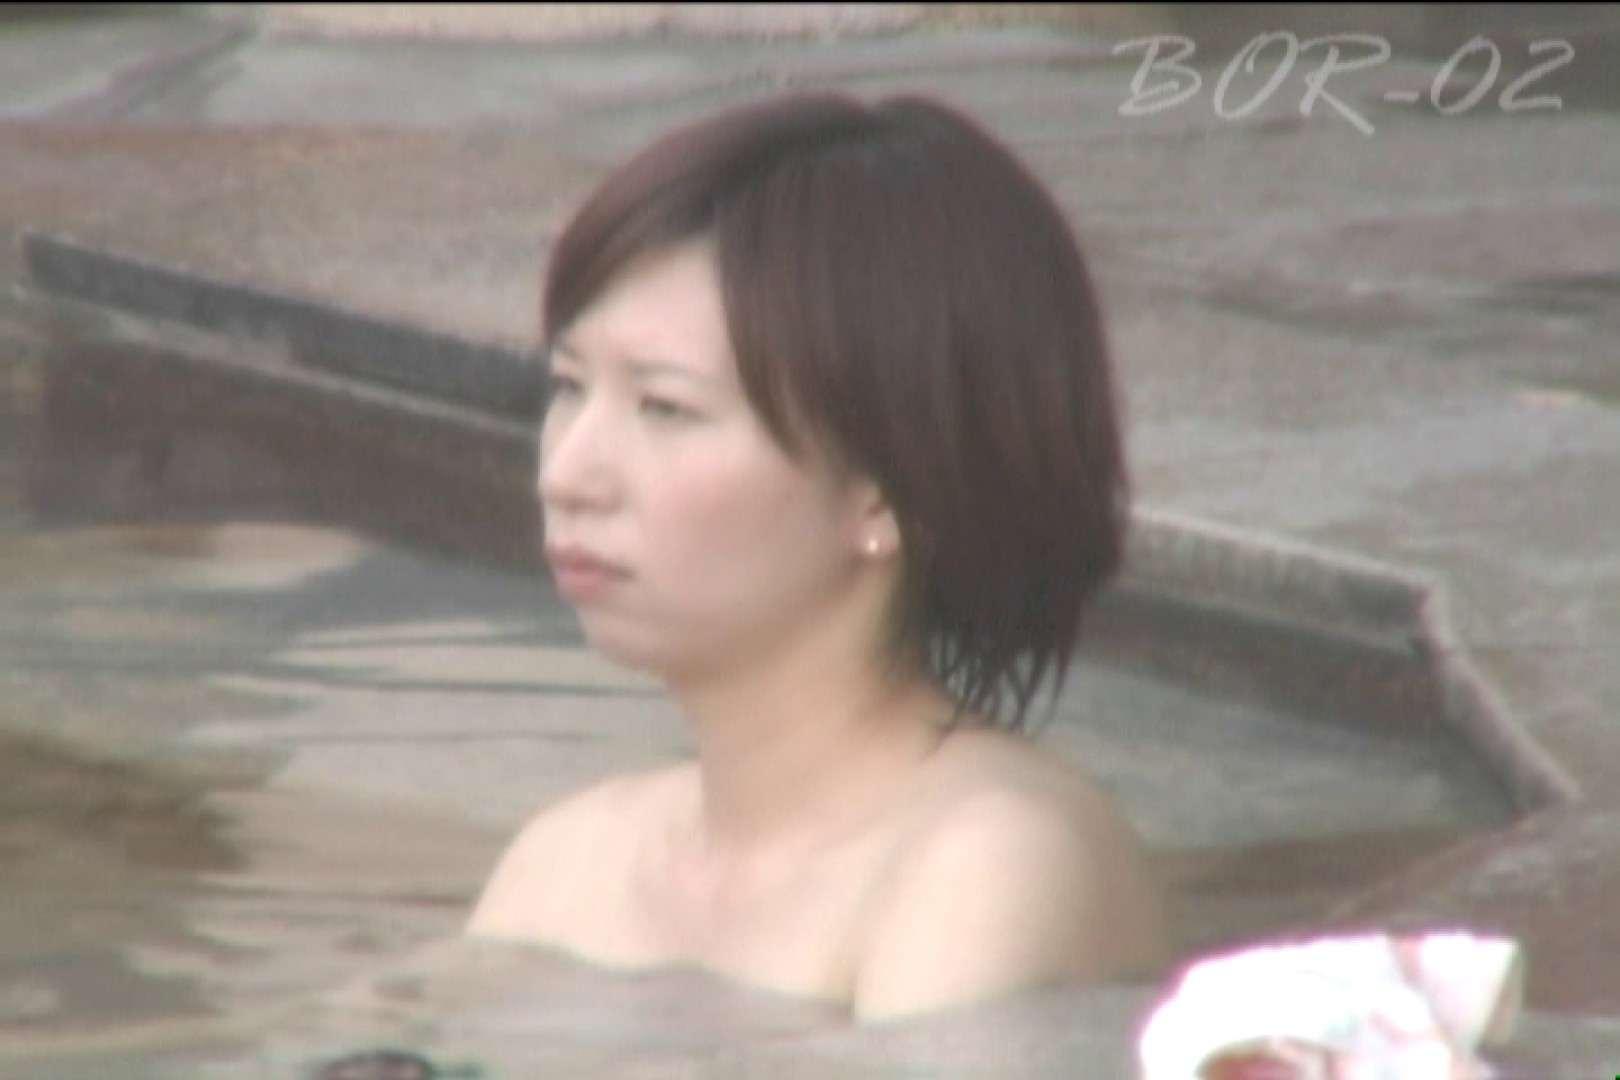 Aquaな露天風呂Vol.475 OLのプライベート | 盗撮特撮  11pic 4